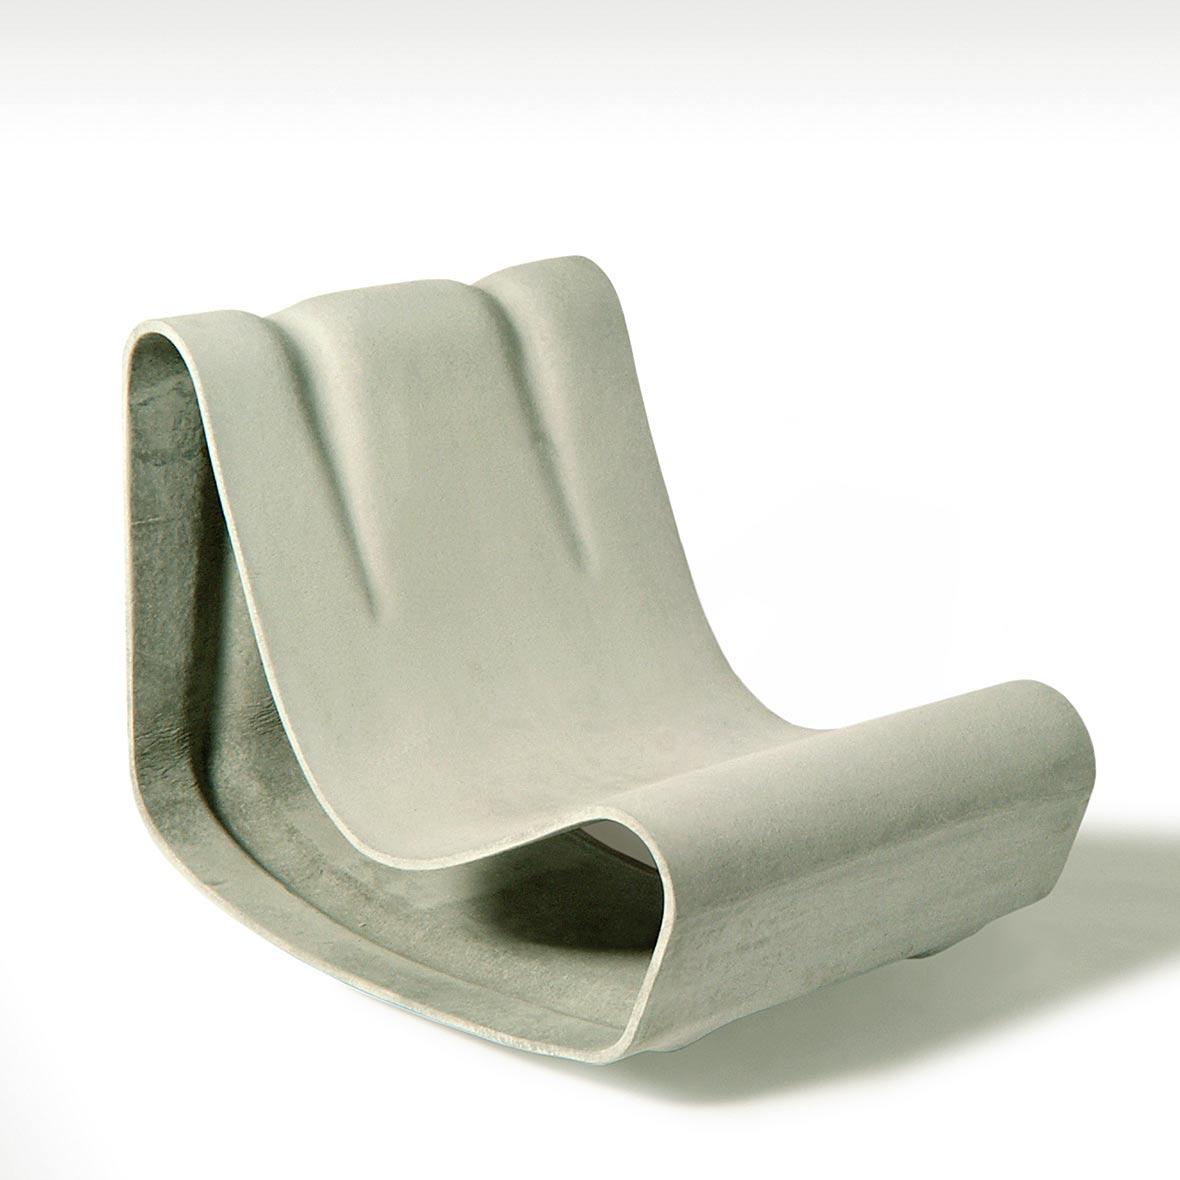 guhl stuhl klassiker von eternit aus faserzement bestswiss. Black Bedroom Furniture Sets. Home Design Ideas